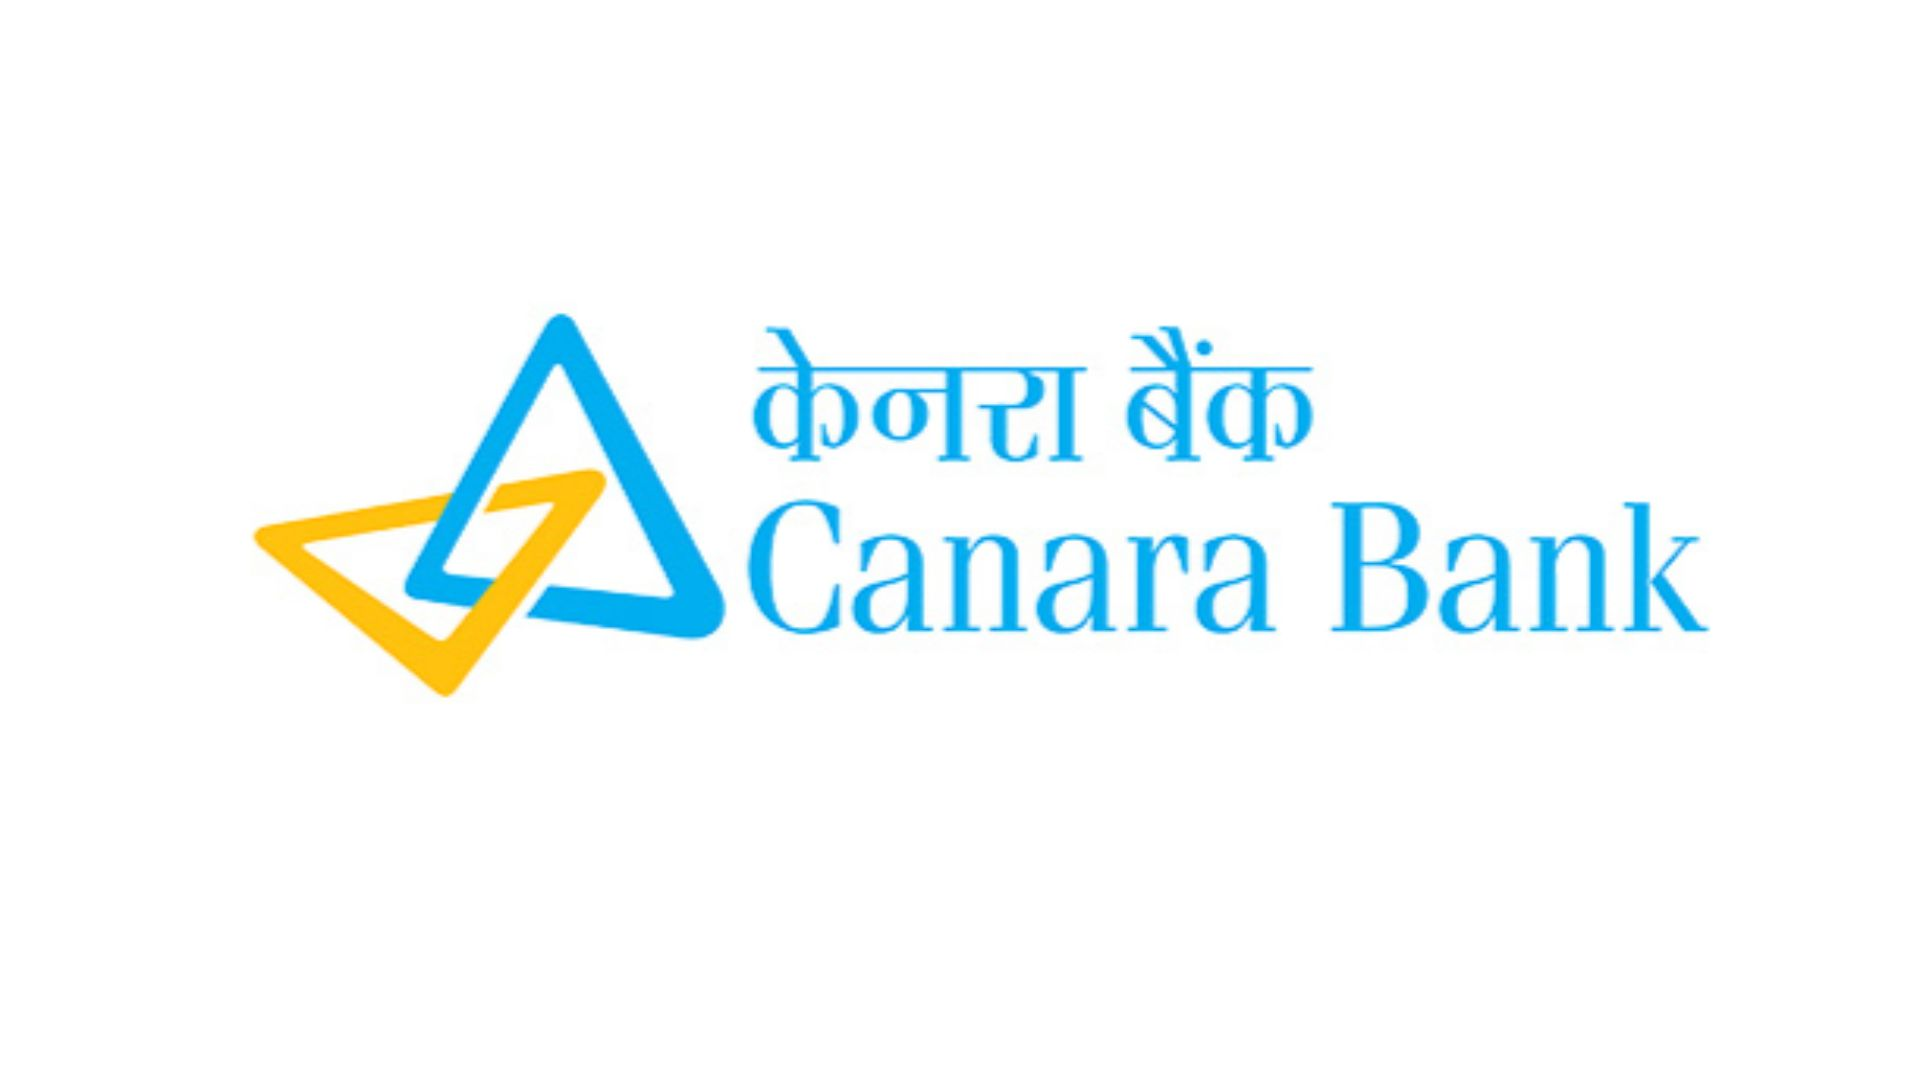 Canara-Bank-1-8-18